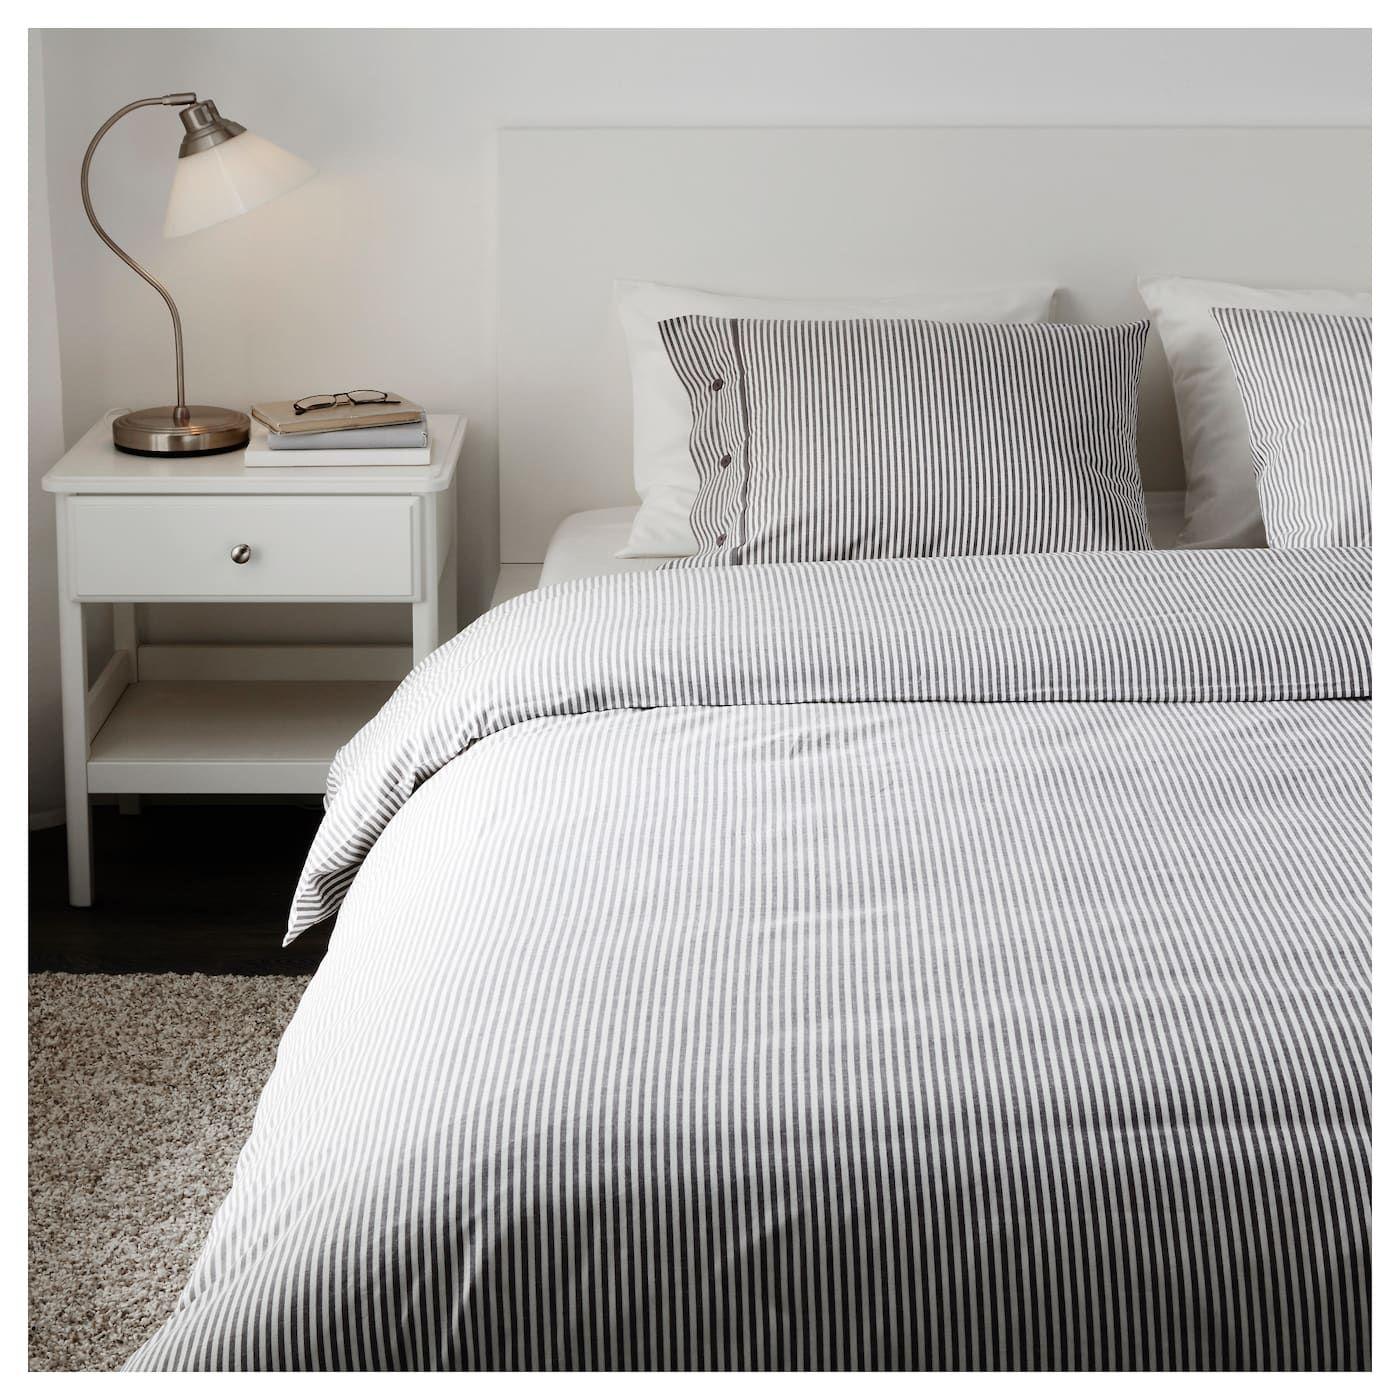 Ikea Nyponros Duvet Cover And Pillowcase S Ikea Duvet Cover Ikea Duvet Striped Bed Sheets